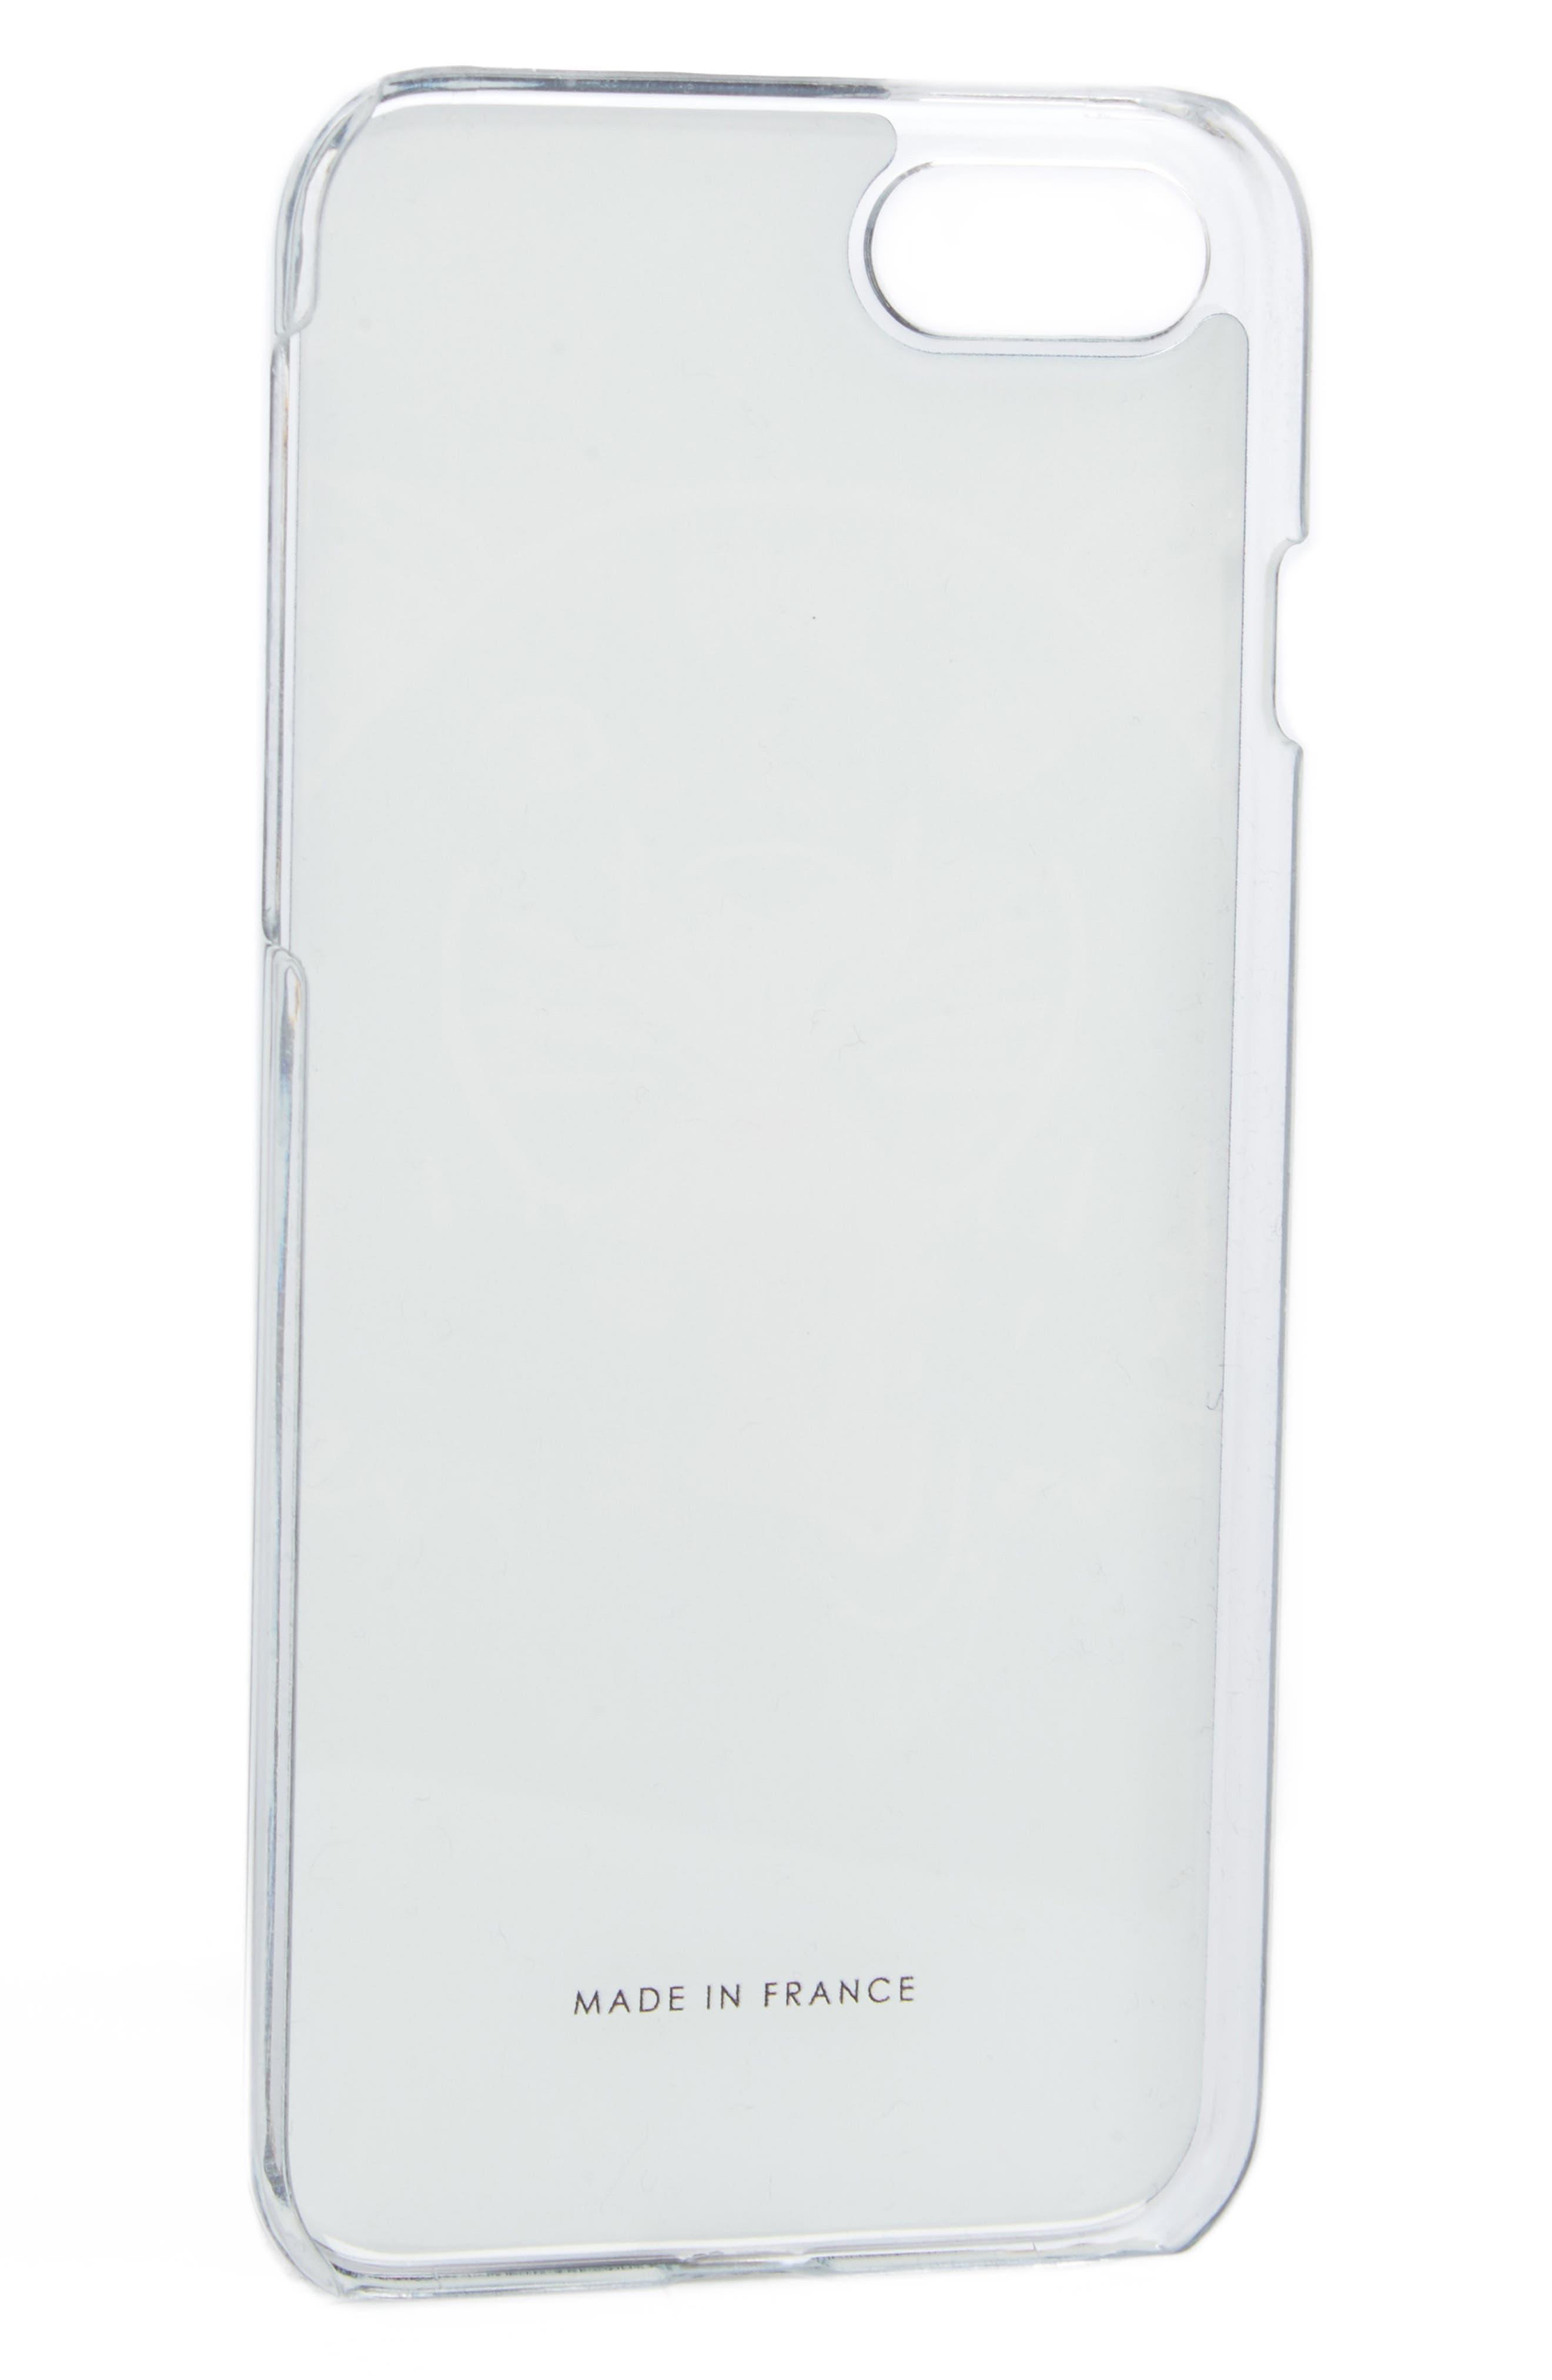 3D Tiger iPhone 7 Case,                             Main thumbnail 1, color,                             NAVY BLUE